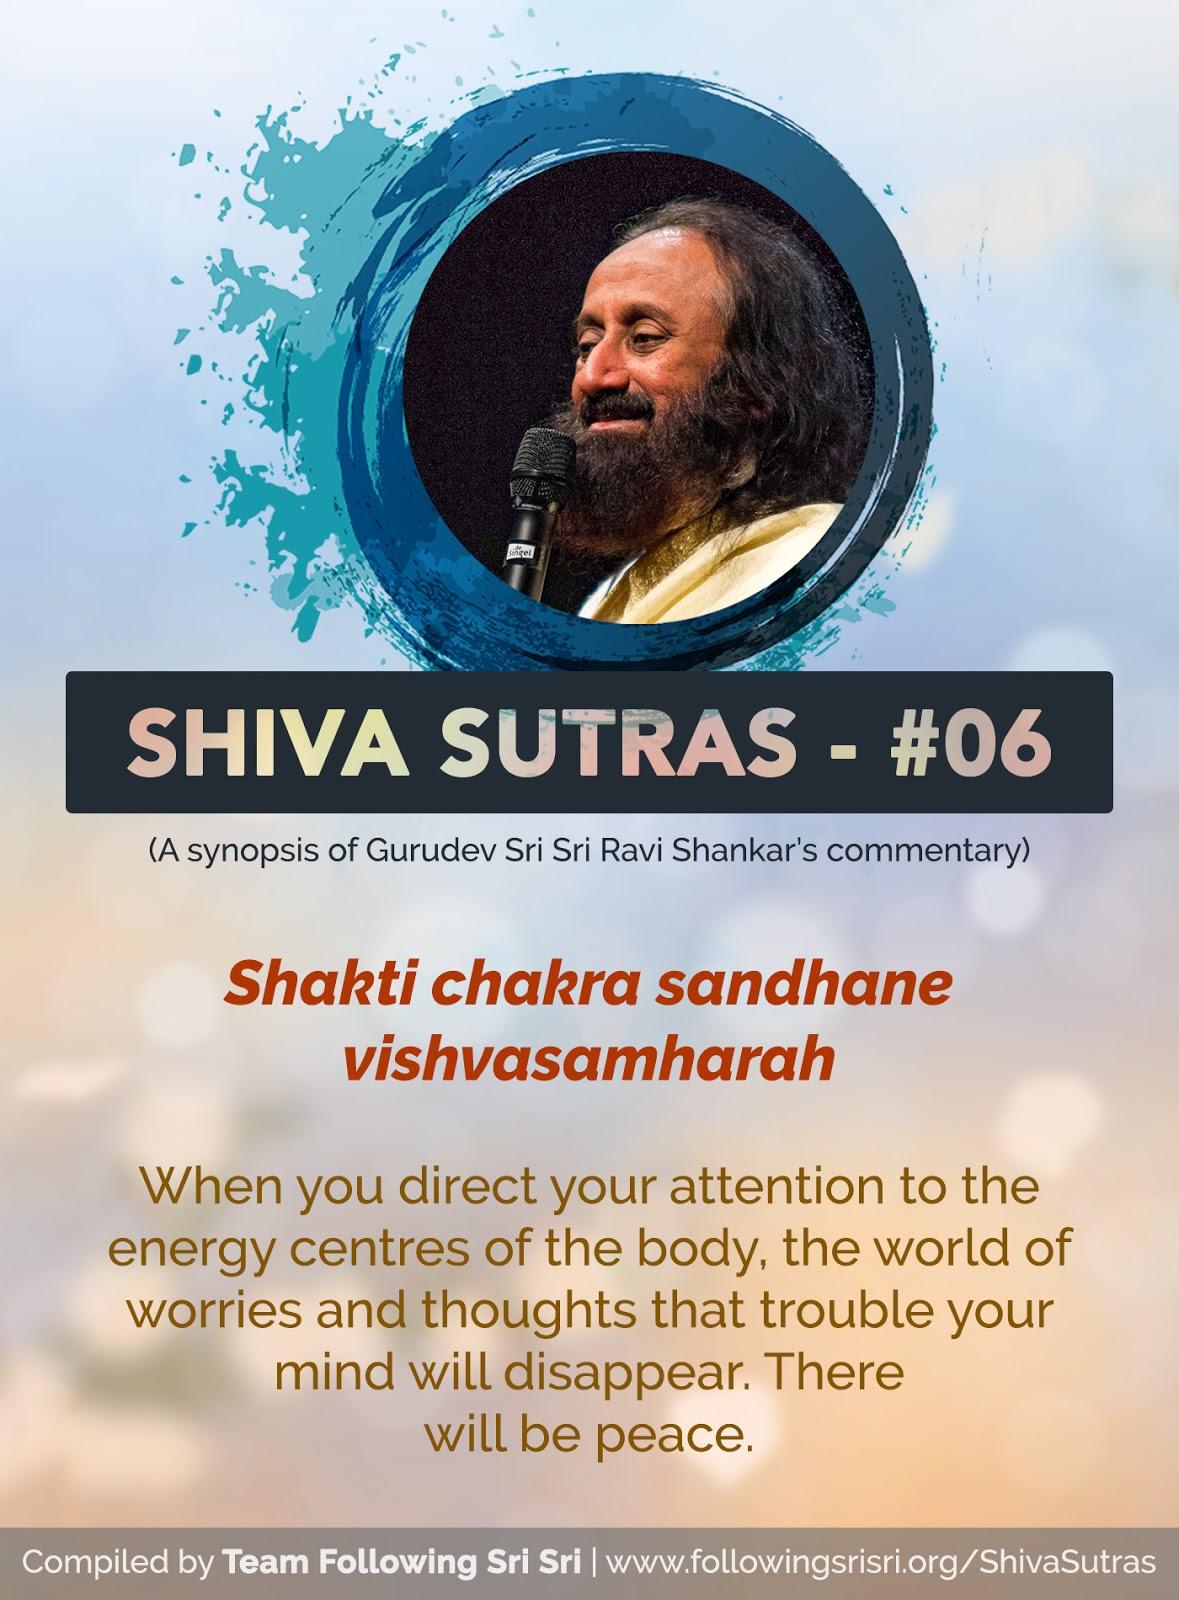 Shiva Sutras - Sutra 6